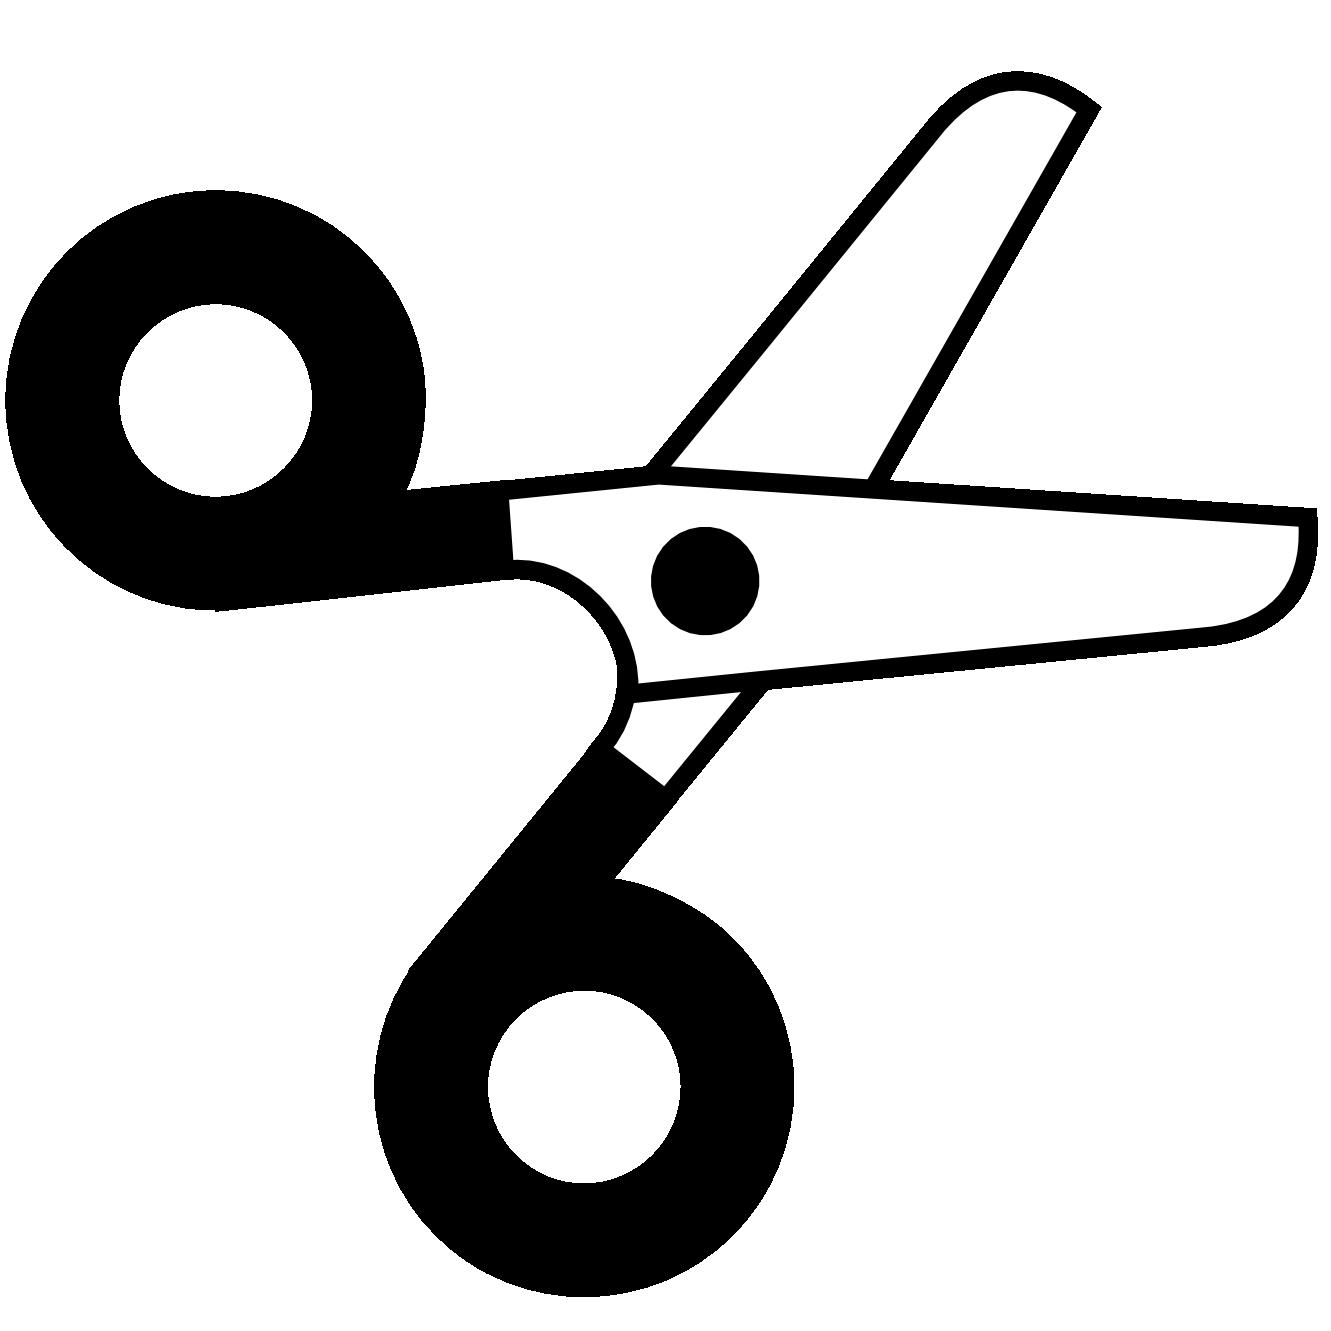 1331x1331 Scissors Clipart Black And White Clipart Panda